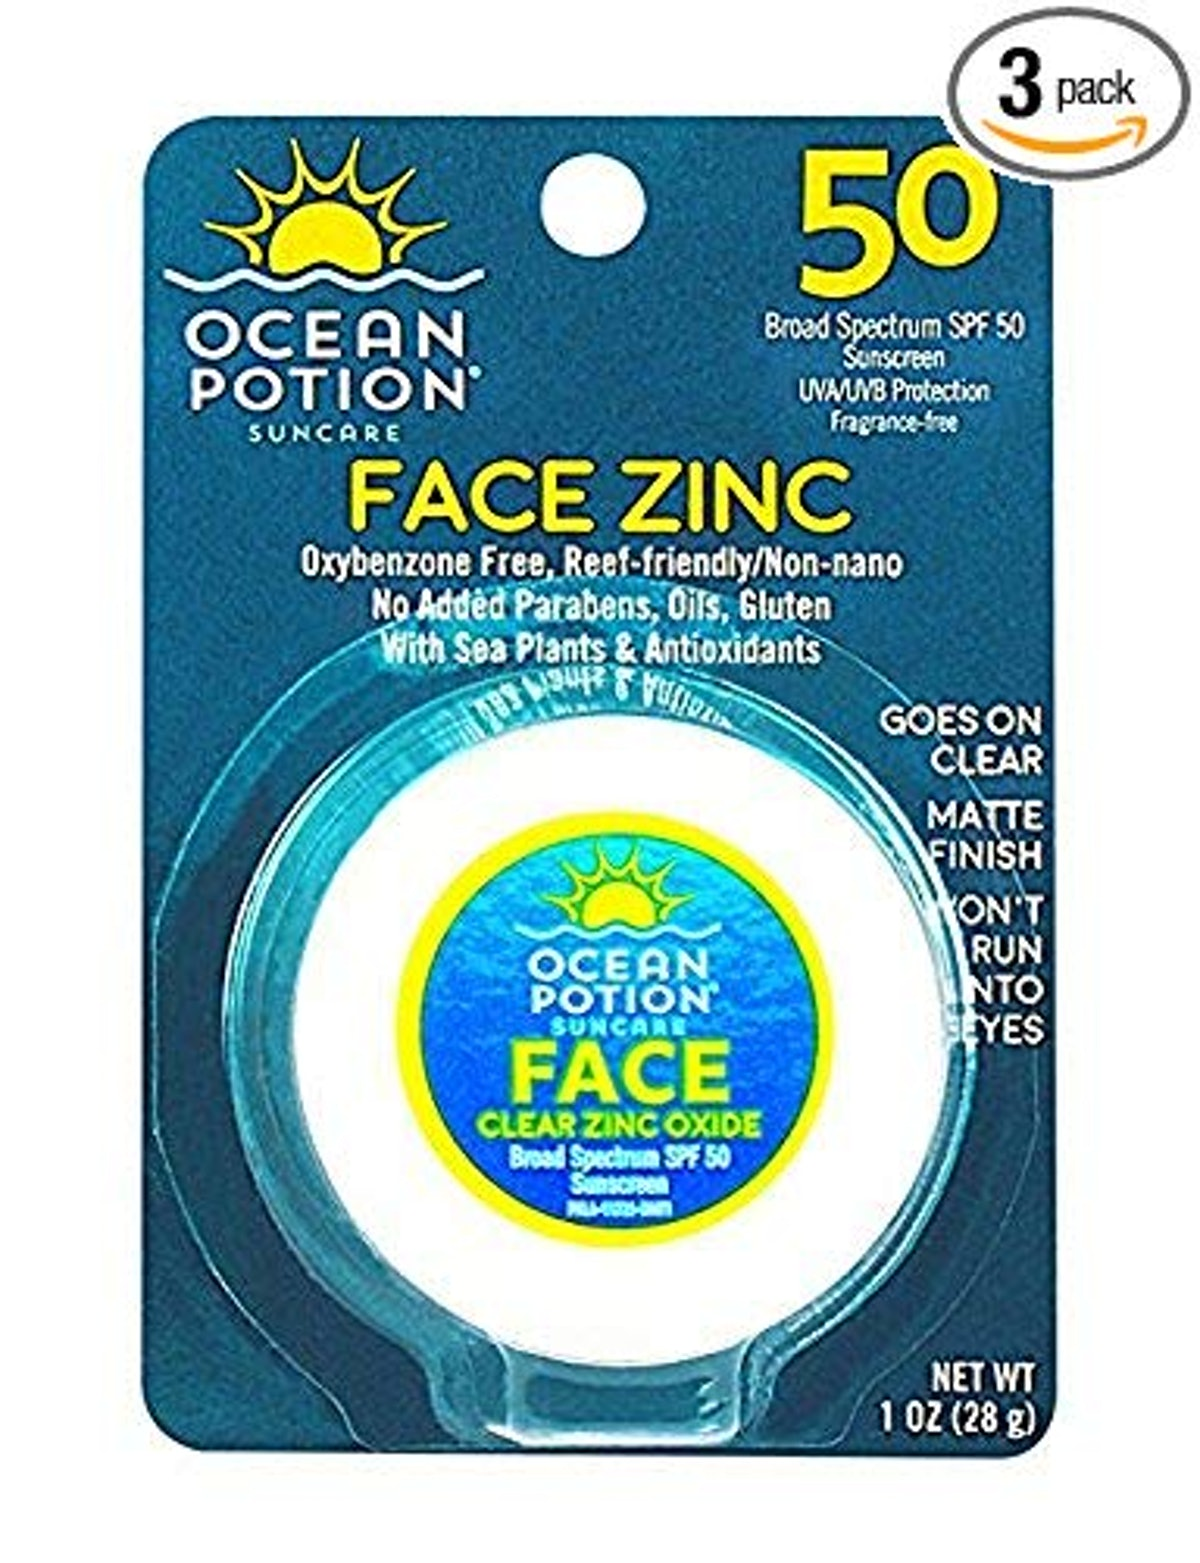 Ocean Potion Face Zinc SPF 50 (3 pack)